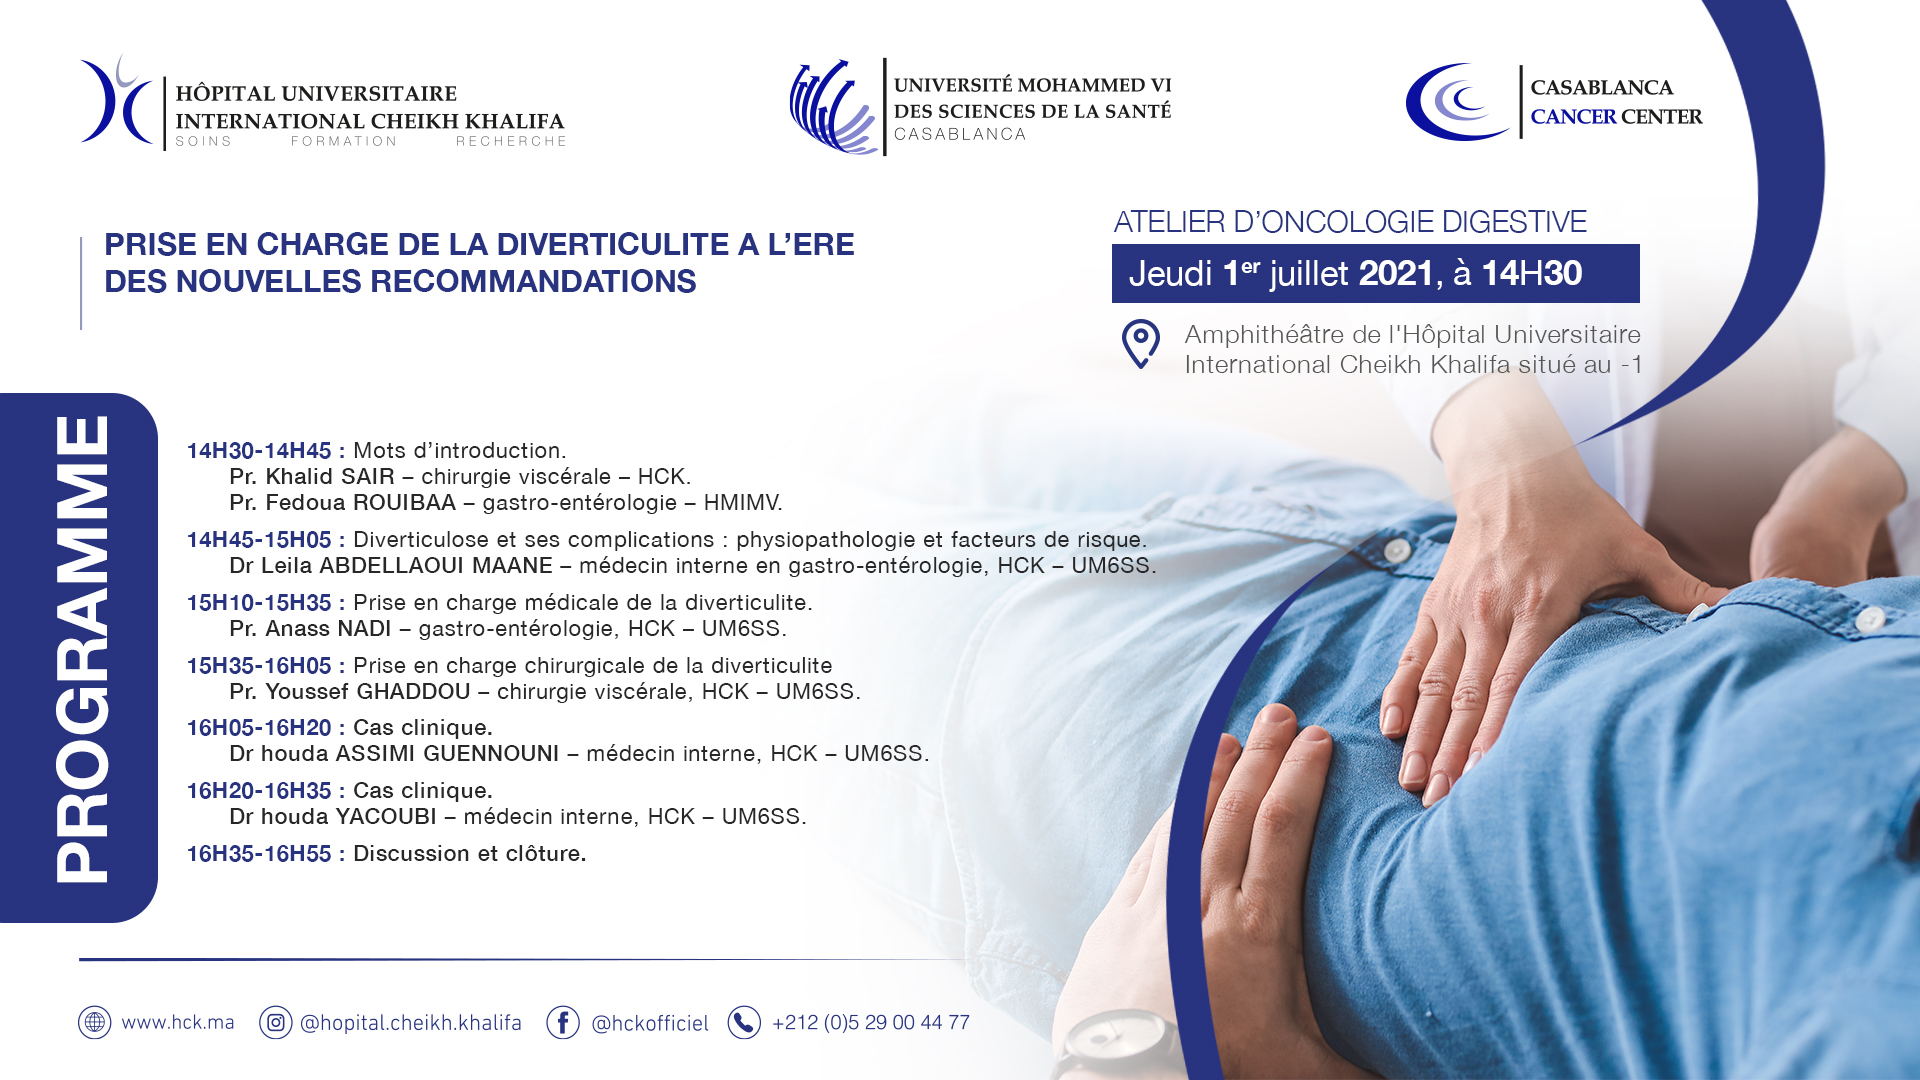 Programme_-_Atelier_de_pathologie_digestive_1er_juillet_2021_-_19